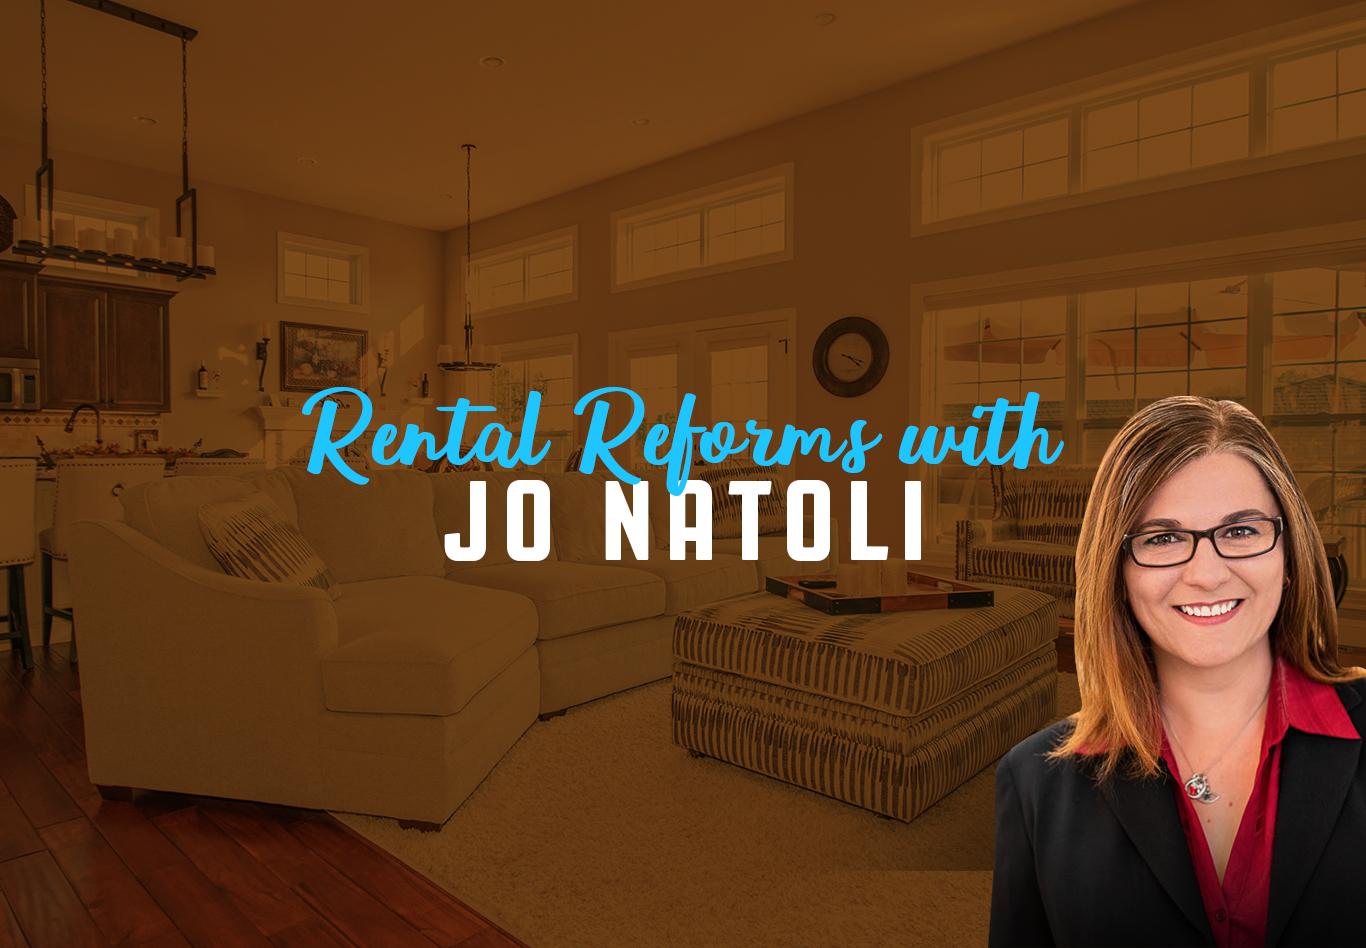 _79343 - Podcast Episode - Jo Natoli - Blog v3.jpgRENTAL REFORMS WITH JO NATOLI